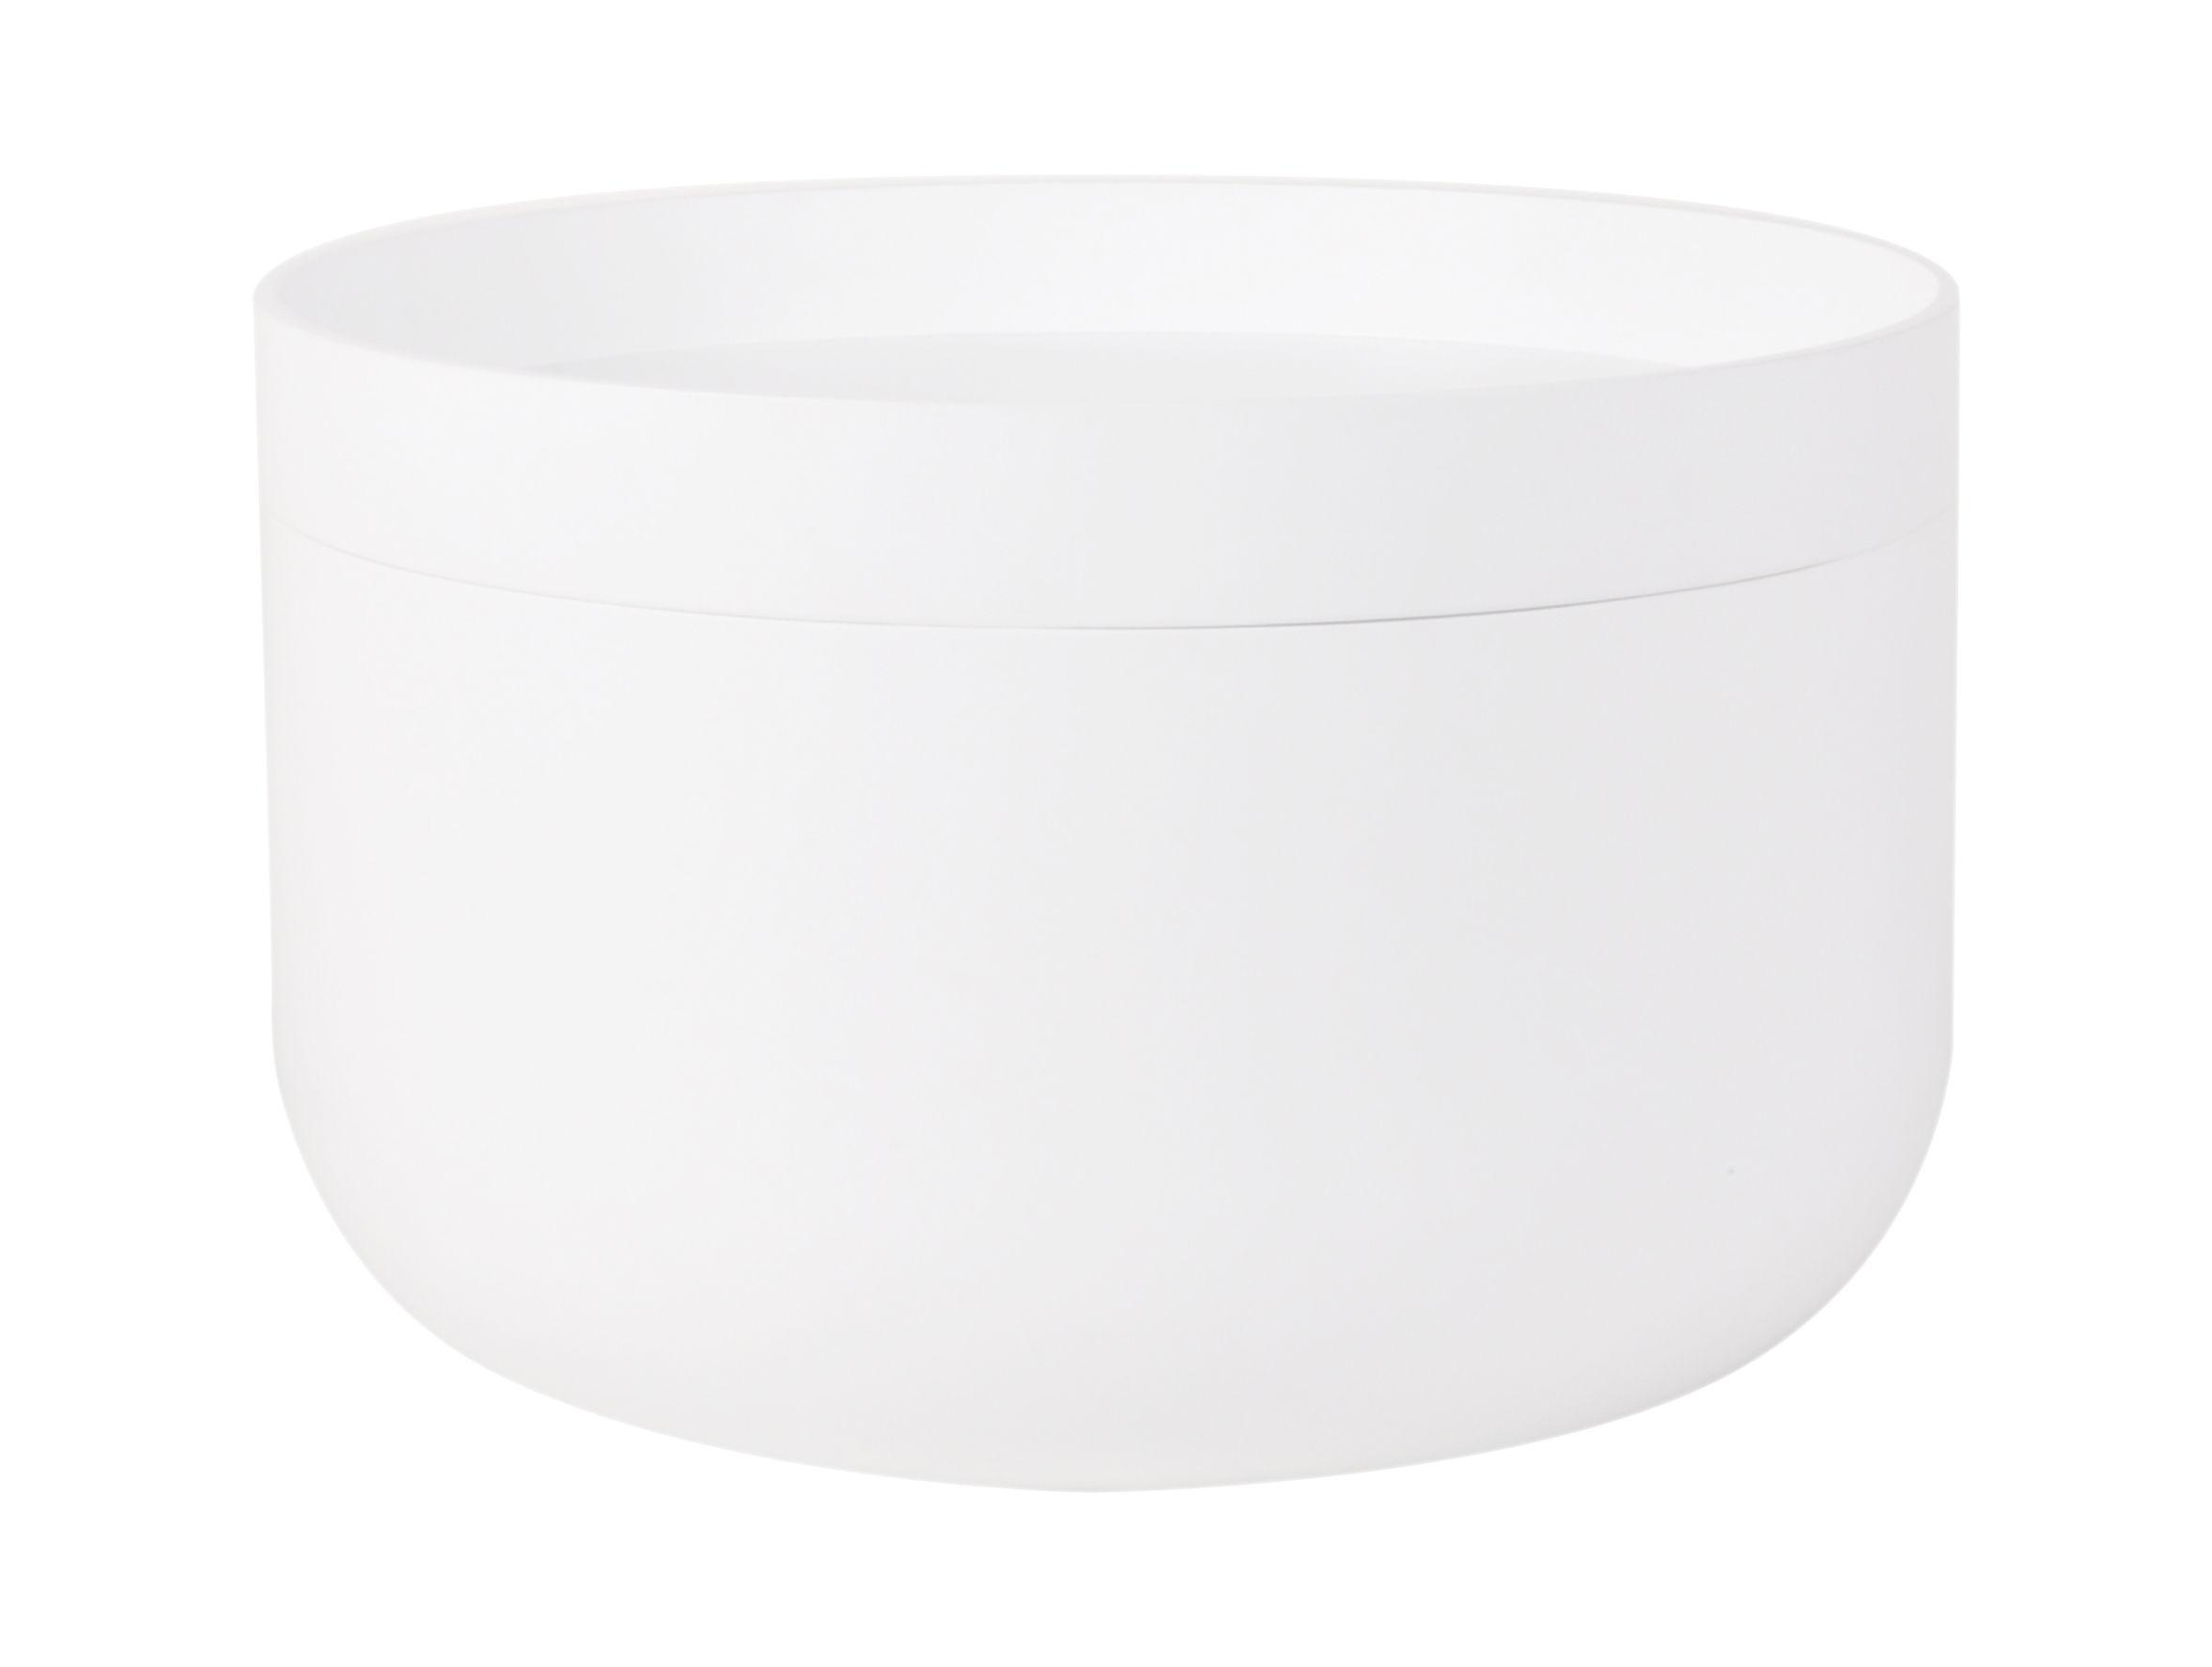 Mobilier - Tables basses - Table basse Stanly / Coffre - Ø 60 x H 38 cm- Plateau amovible - XL Boom - Blanc - Bambou peint, MDF peint